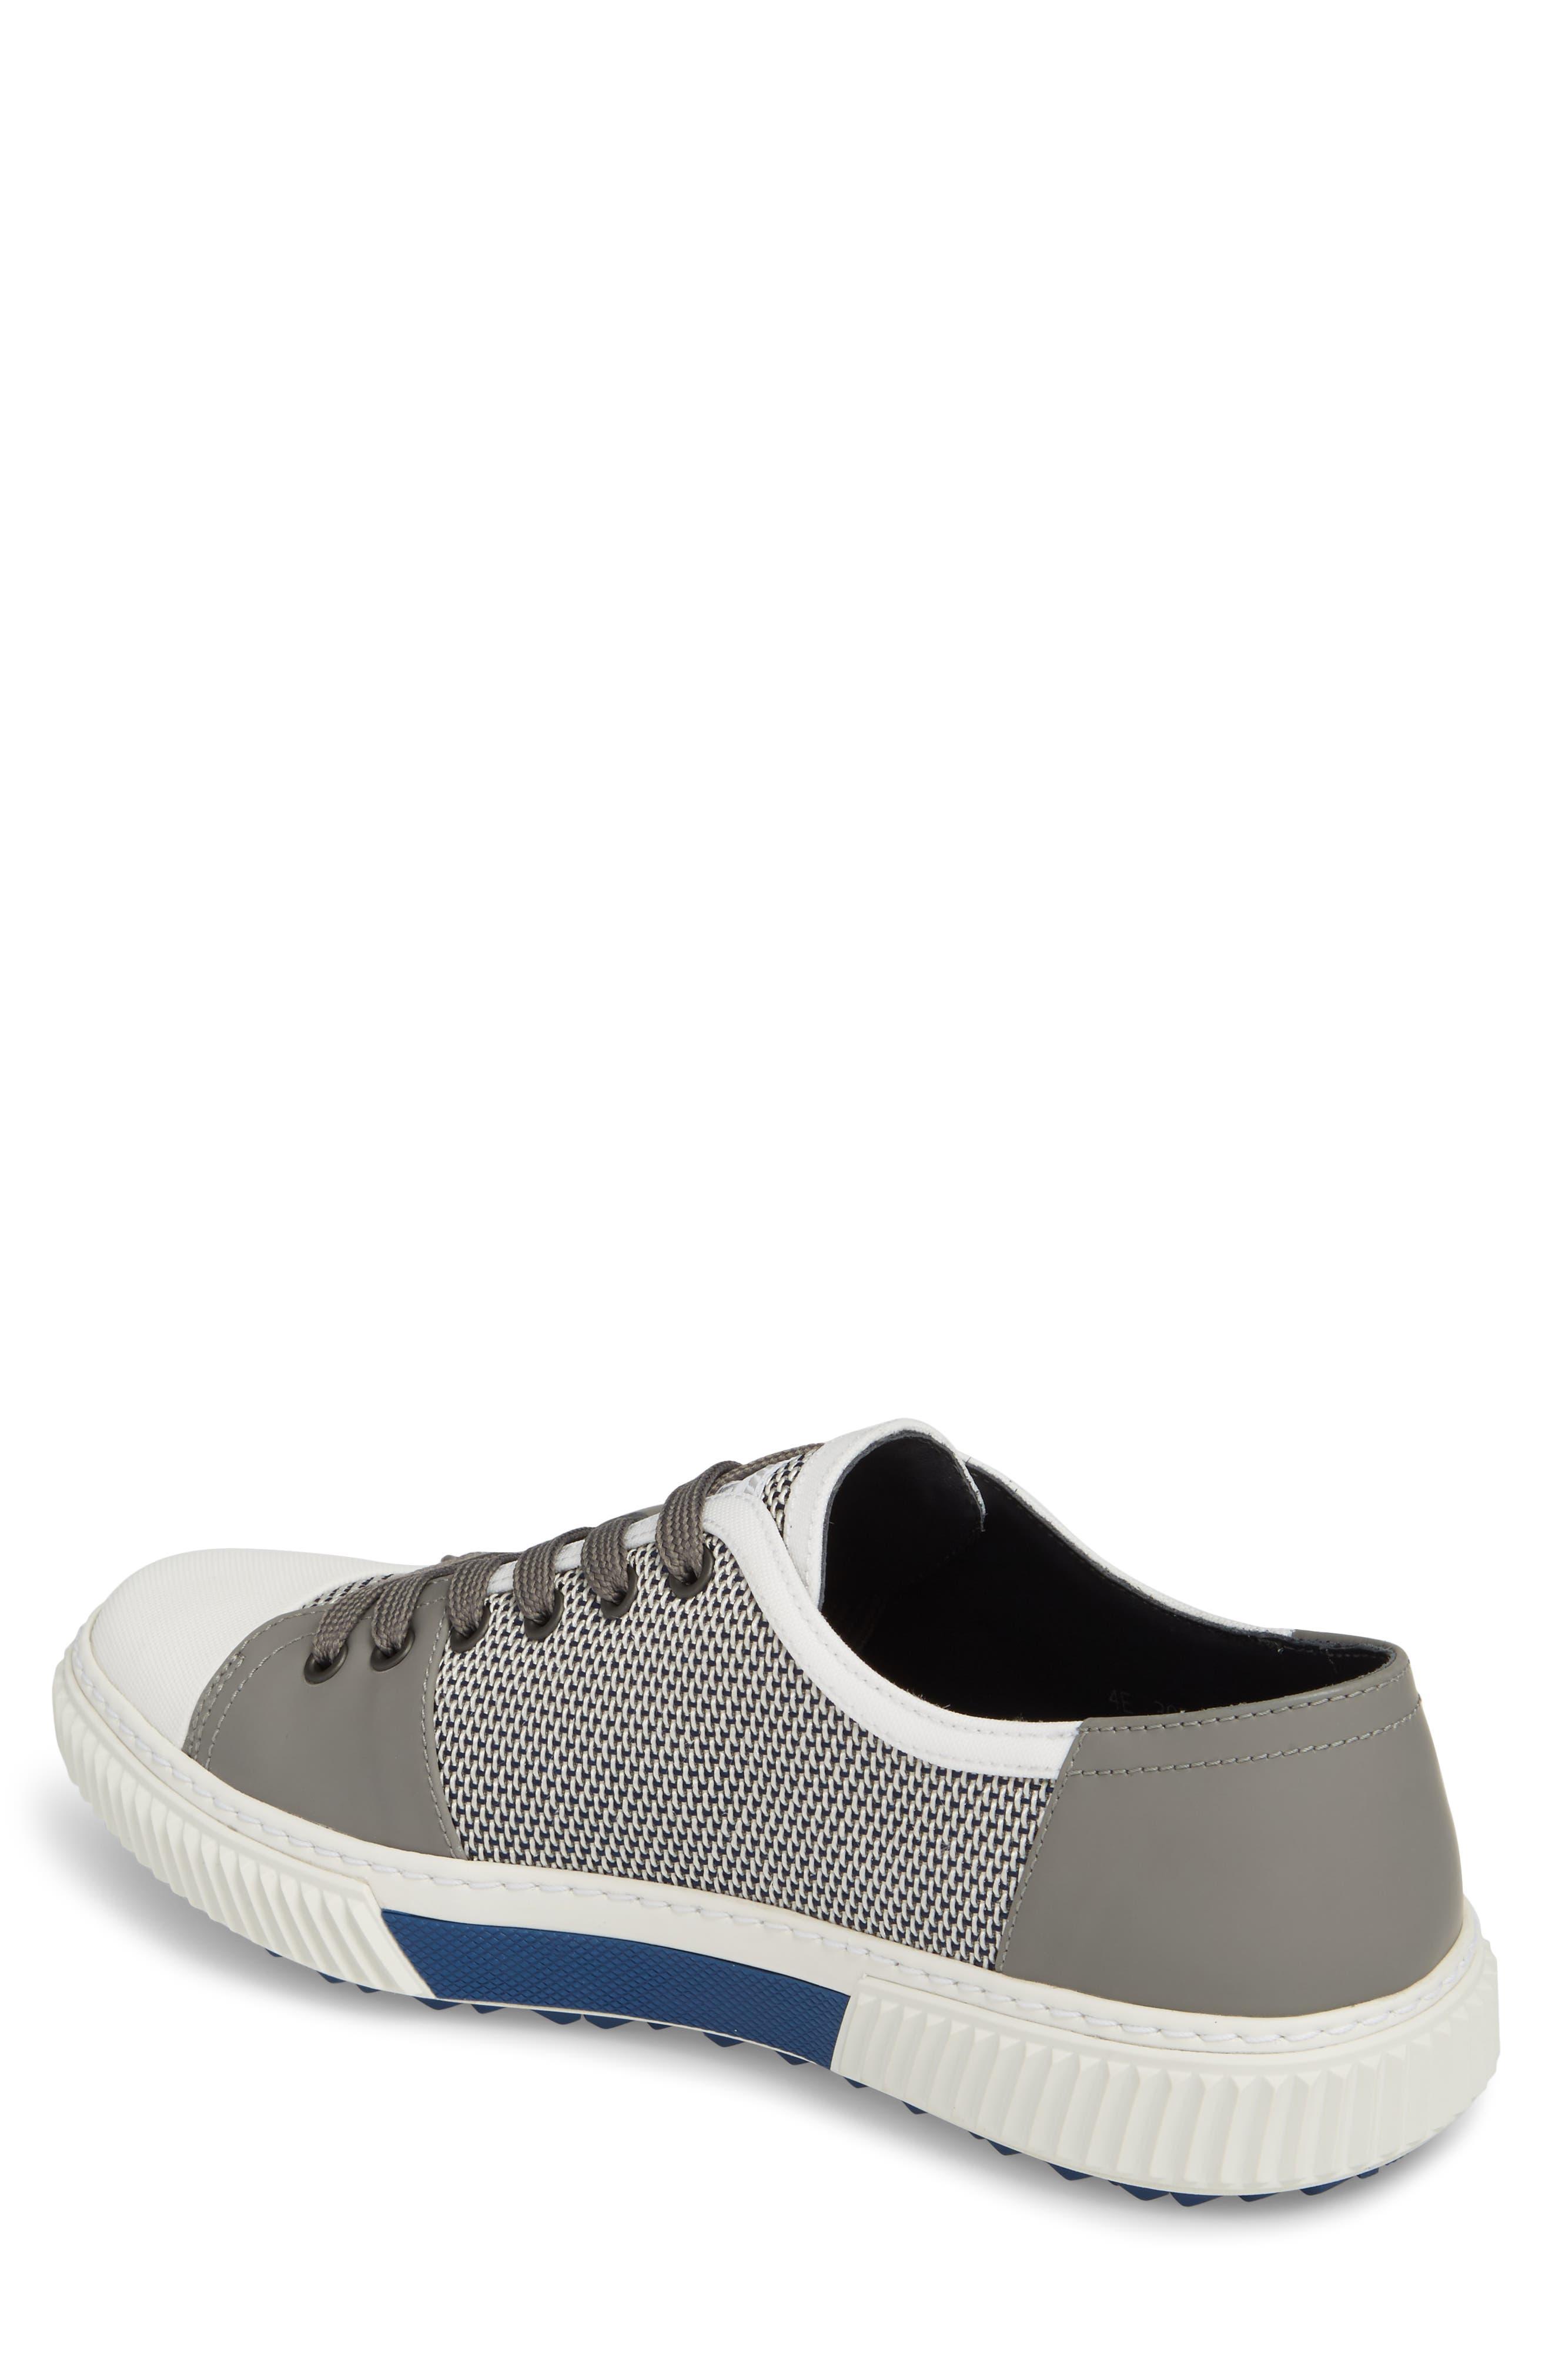 Linea Rossa Low-Top Sneaker,                             Alternate thumbnail 2, color,                             Baltic White